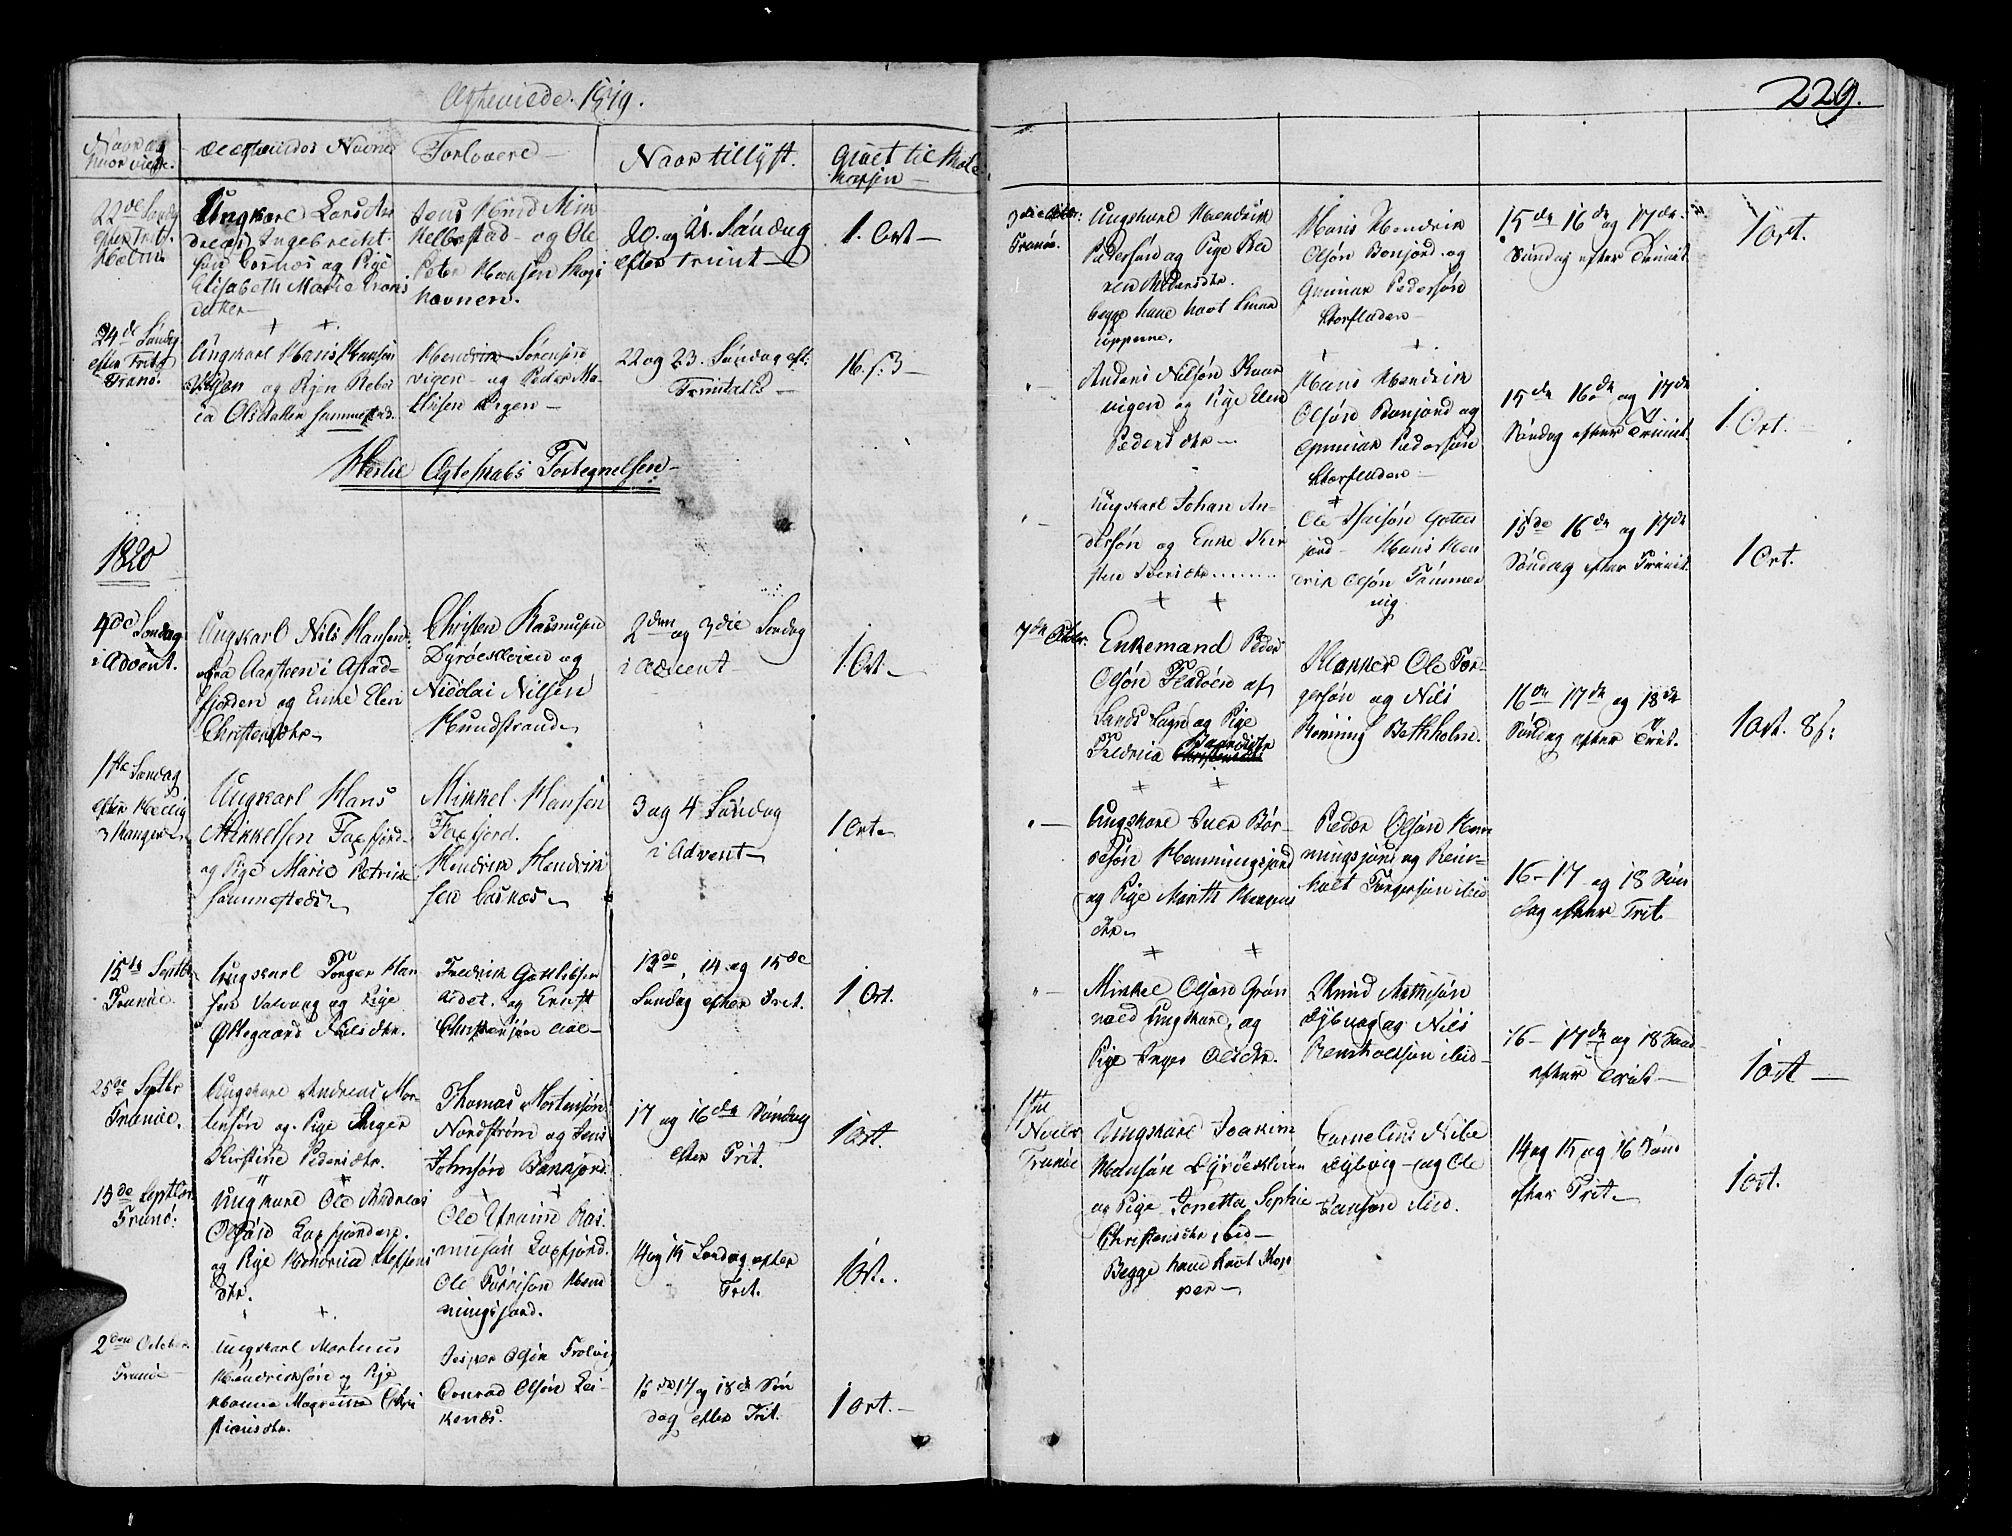 SATØ, Tranøy sokneprestkontor, I/Ia/Iaa/L0003kirke: Ministerialbok nr. 3, 1807-1820, s. 229